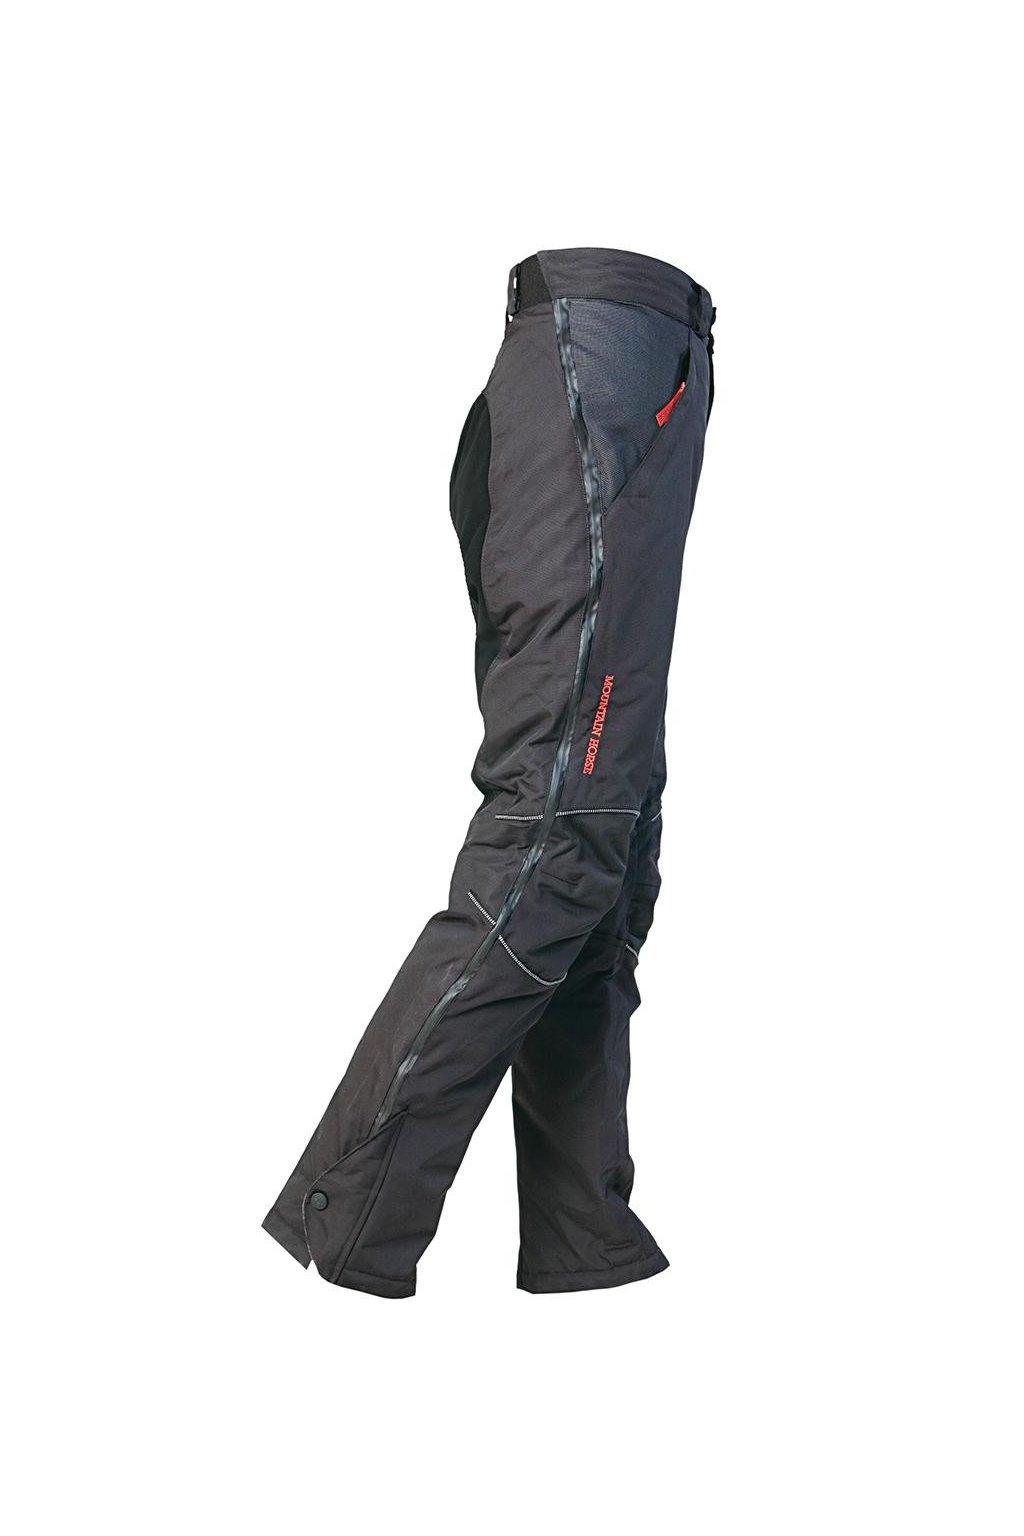 Zimní jezdecké kalhoty Polar Mountain Horse FS